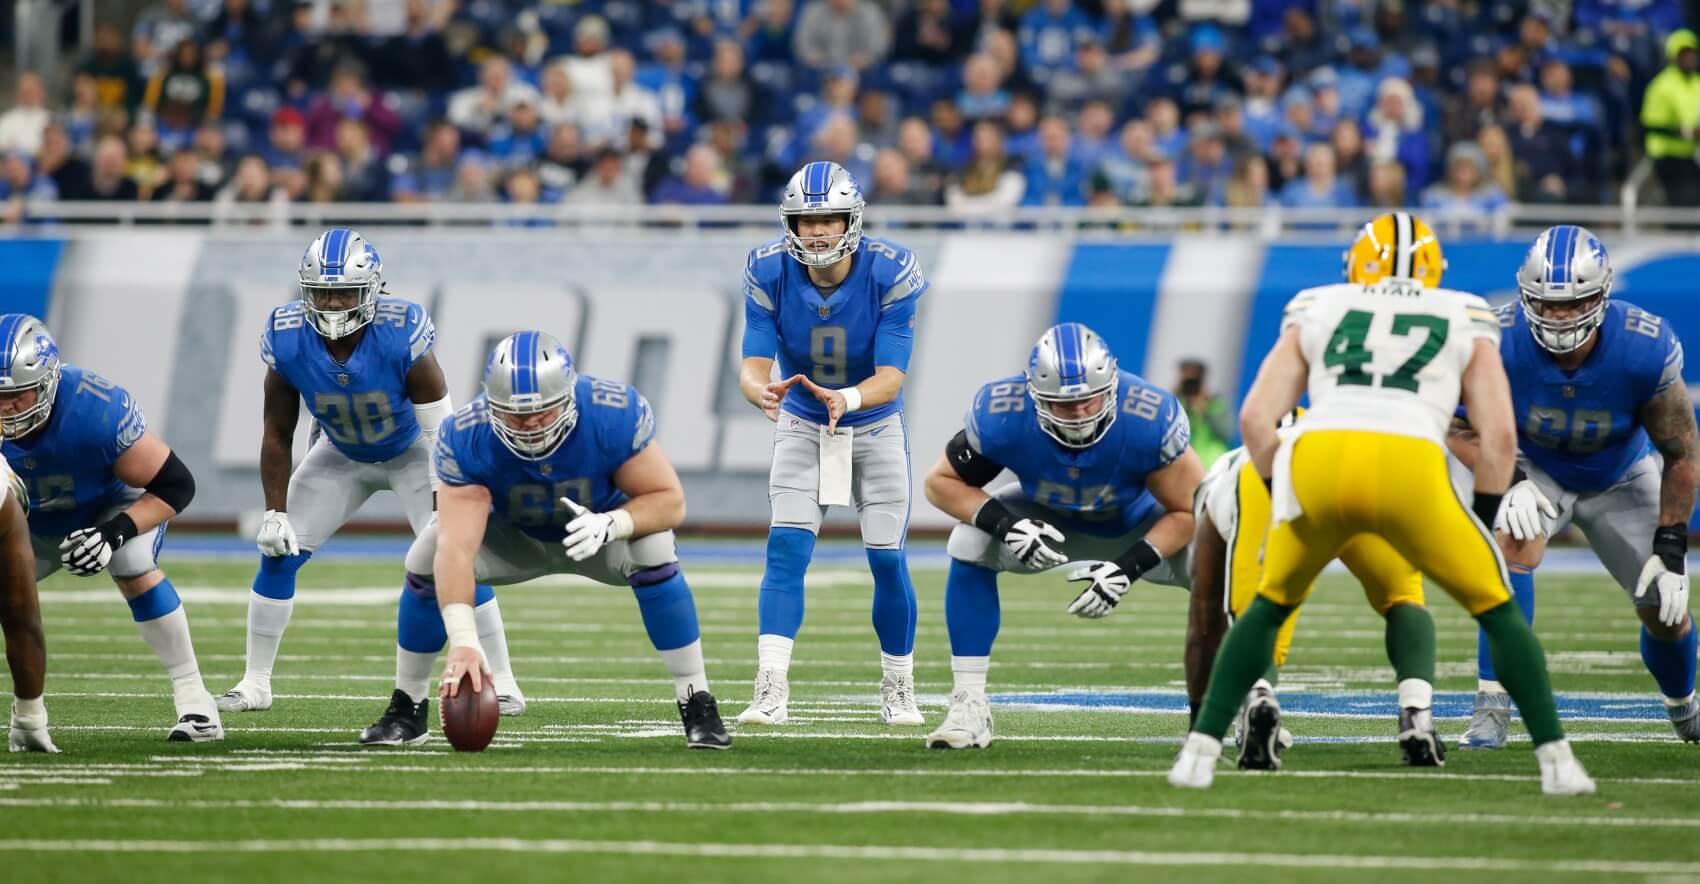 Fantasy Football: Offensive Lines & Their Effect Entering 2018 Season